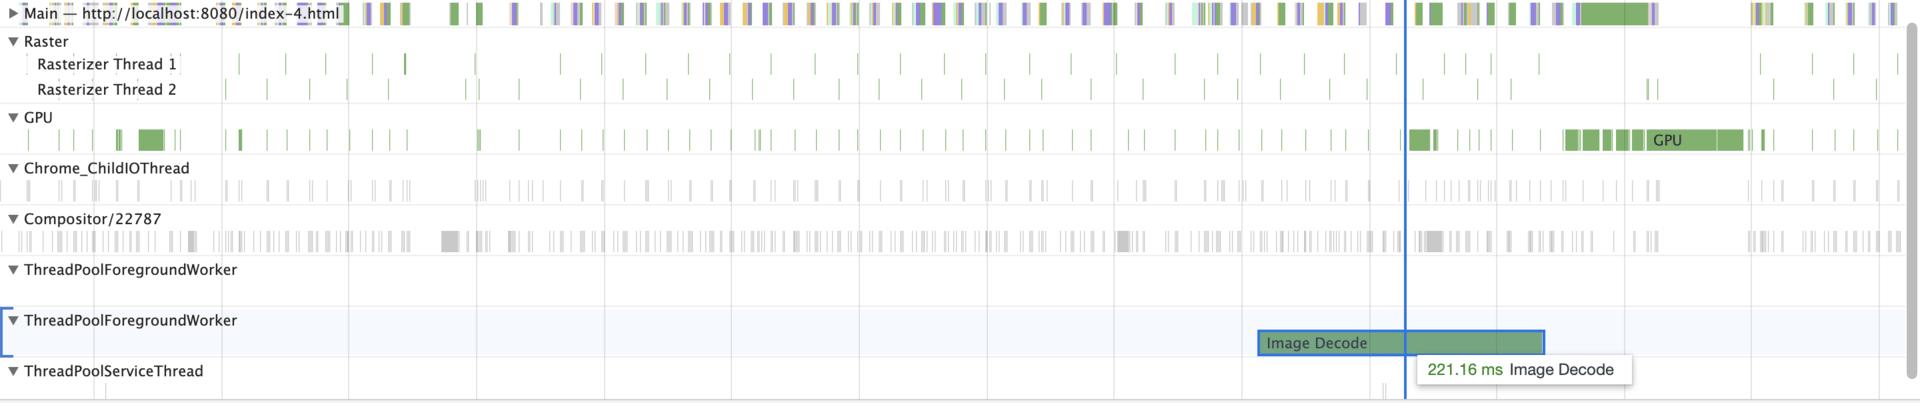 Chrome Sample Timing